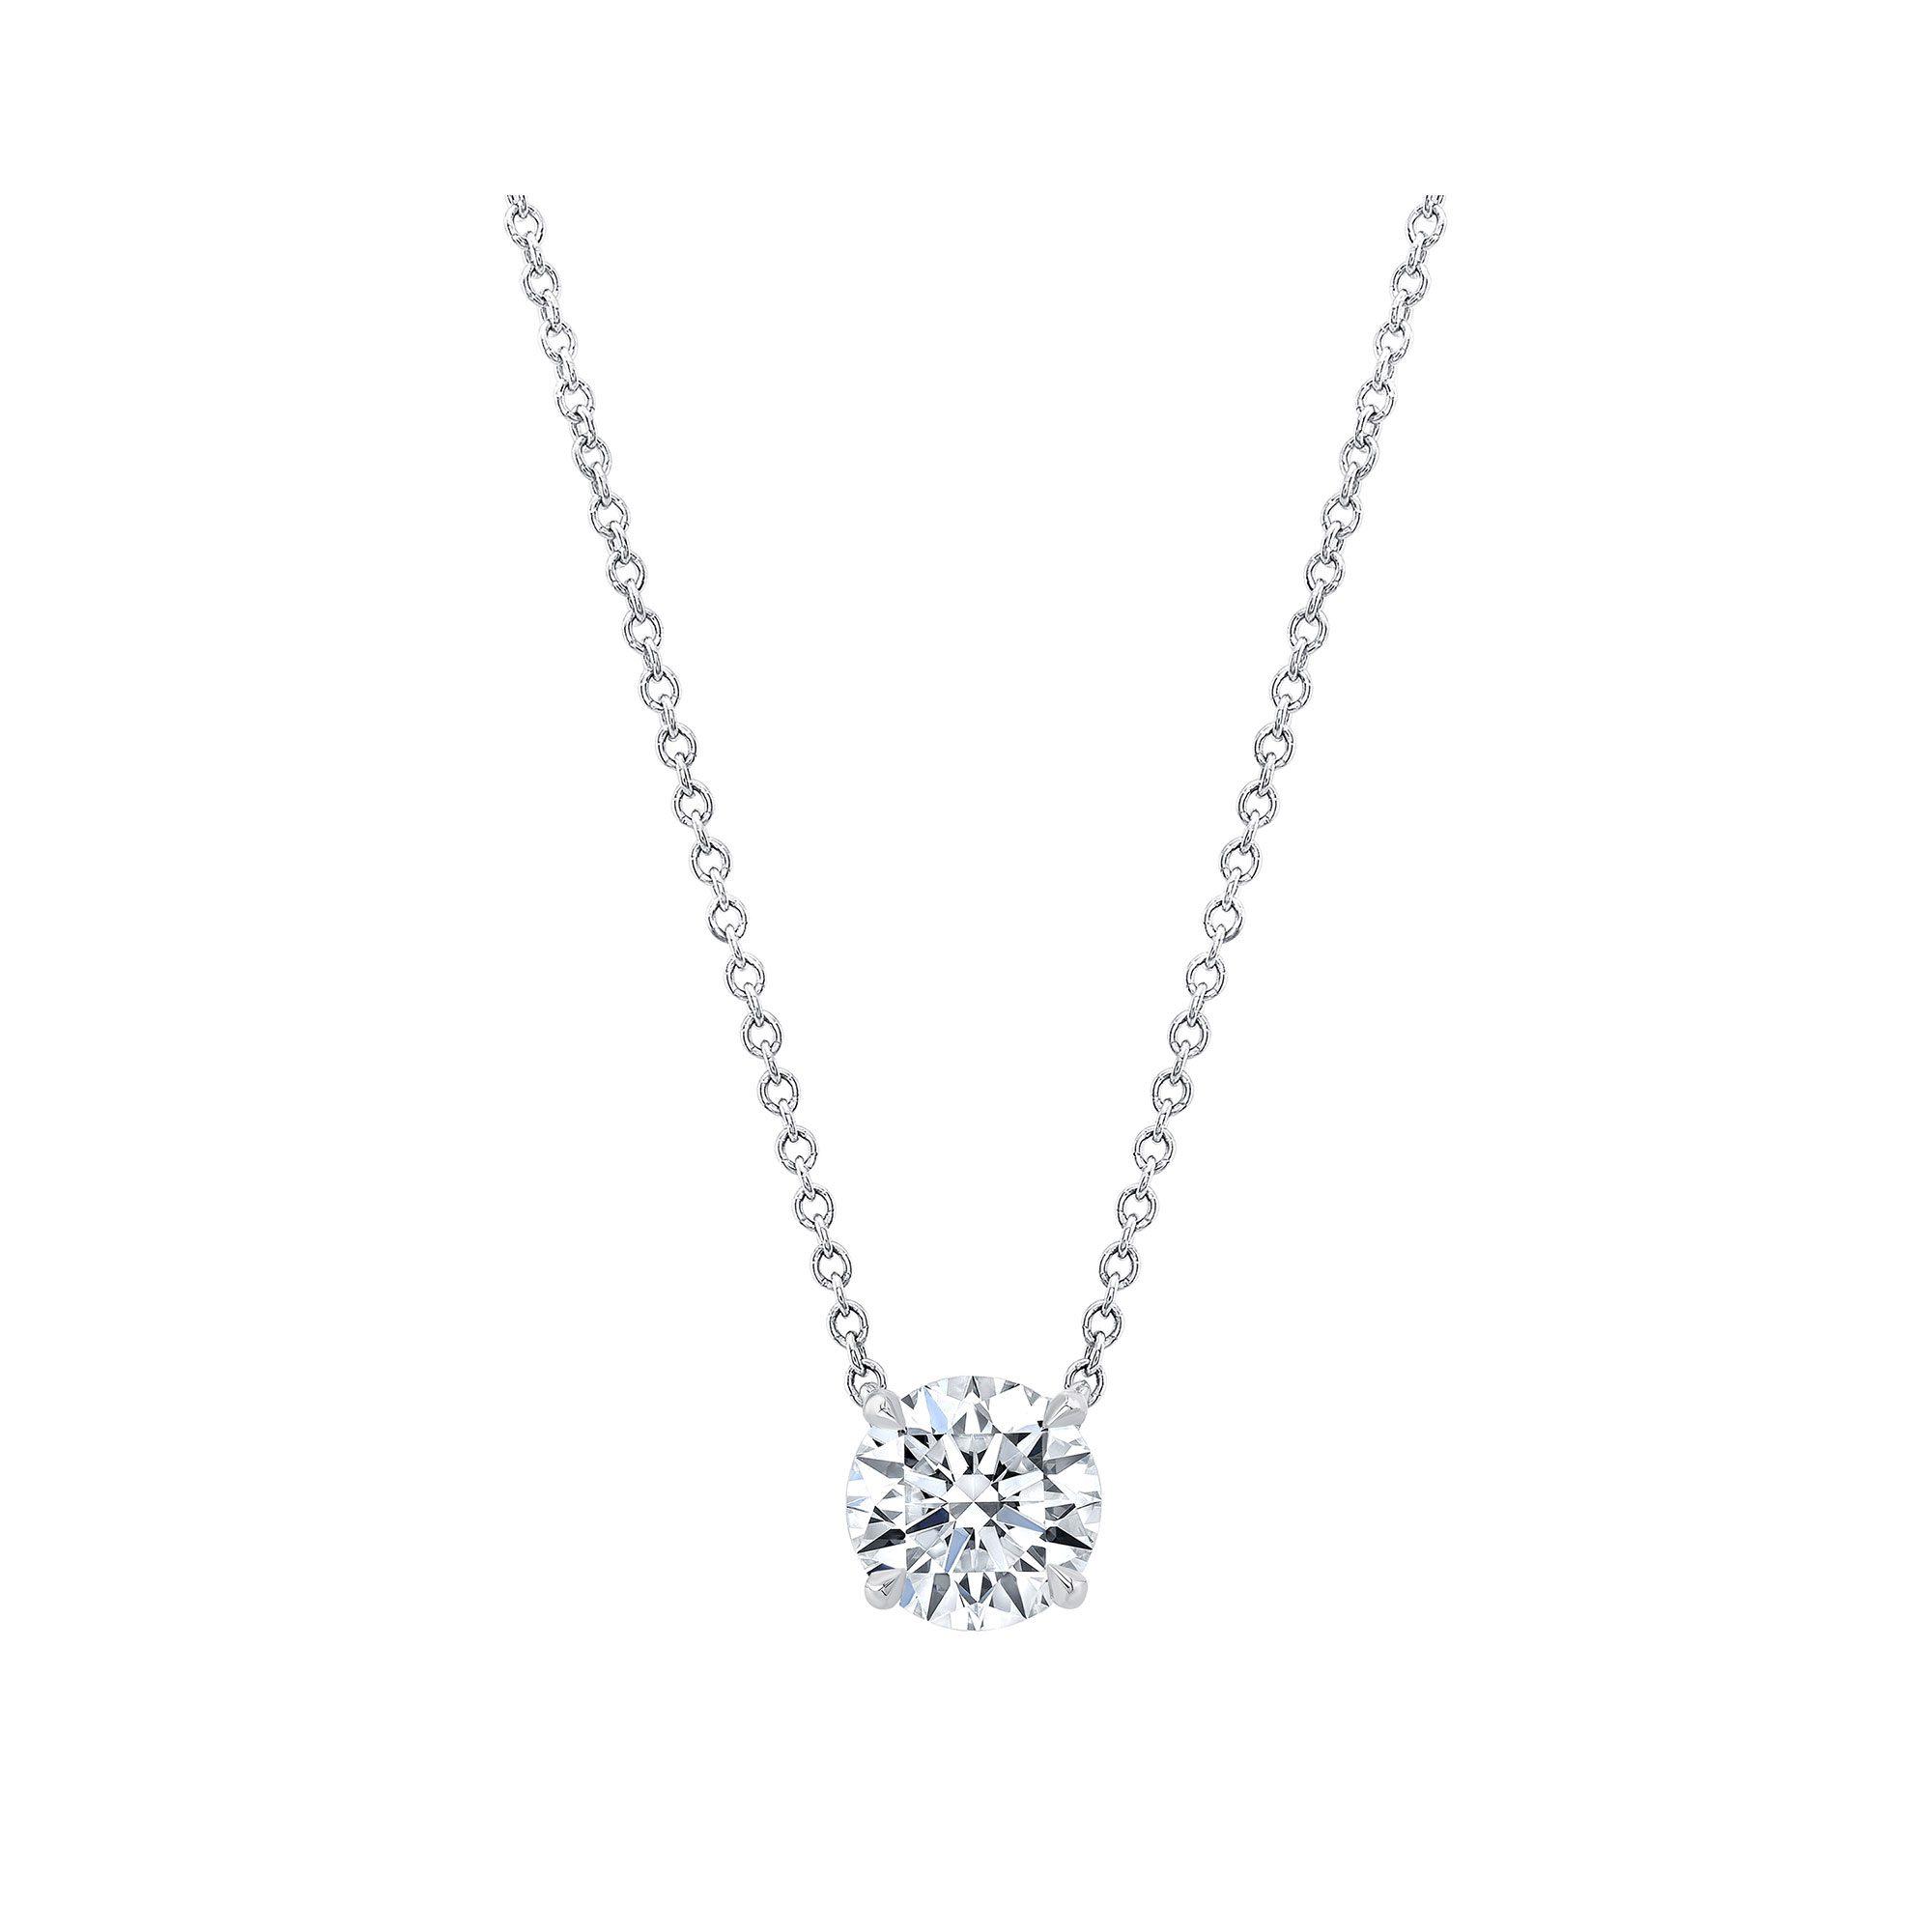 Marie Round Brilliant 1.5 Carat Lab Grown Diamond Necklace Pendant in White Gold